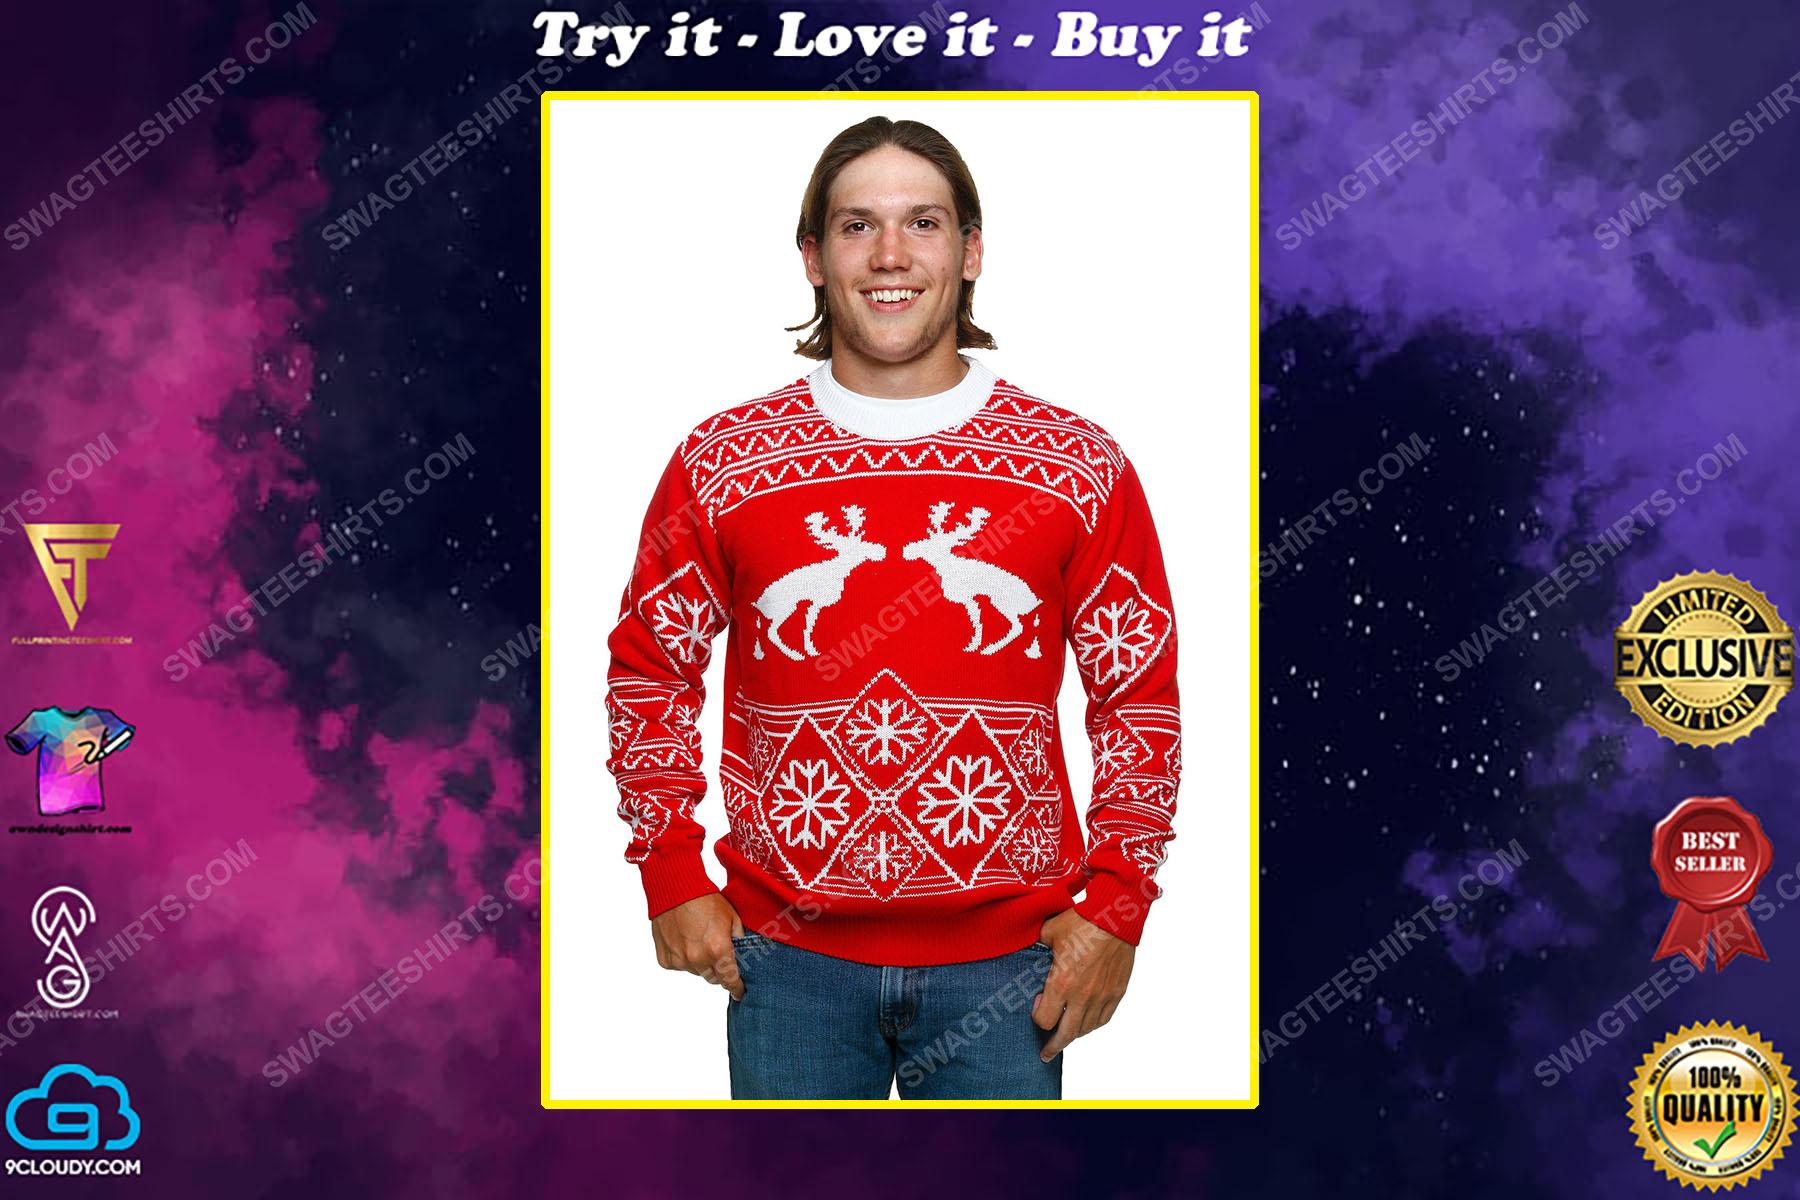 Pooping moose full print ugly christmas sweater